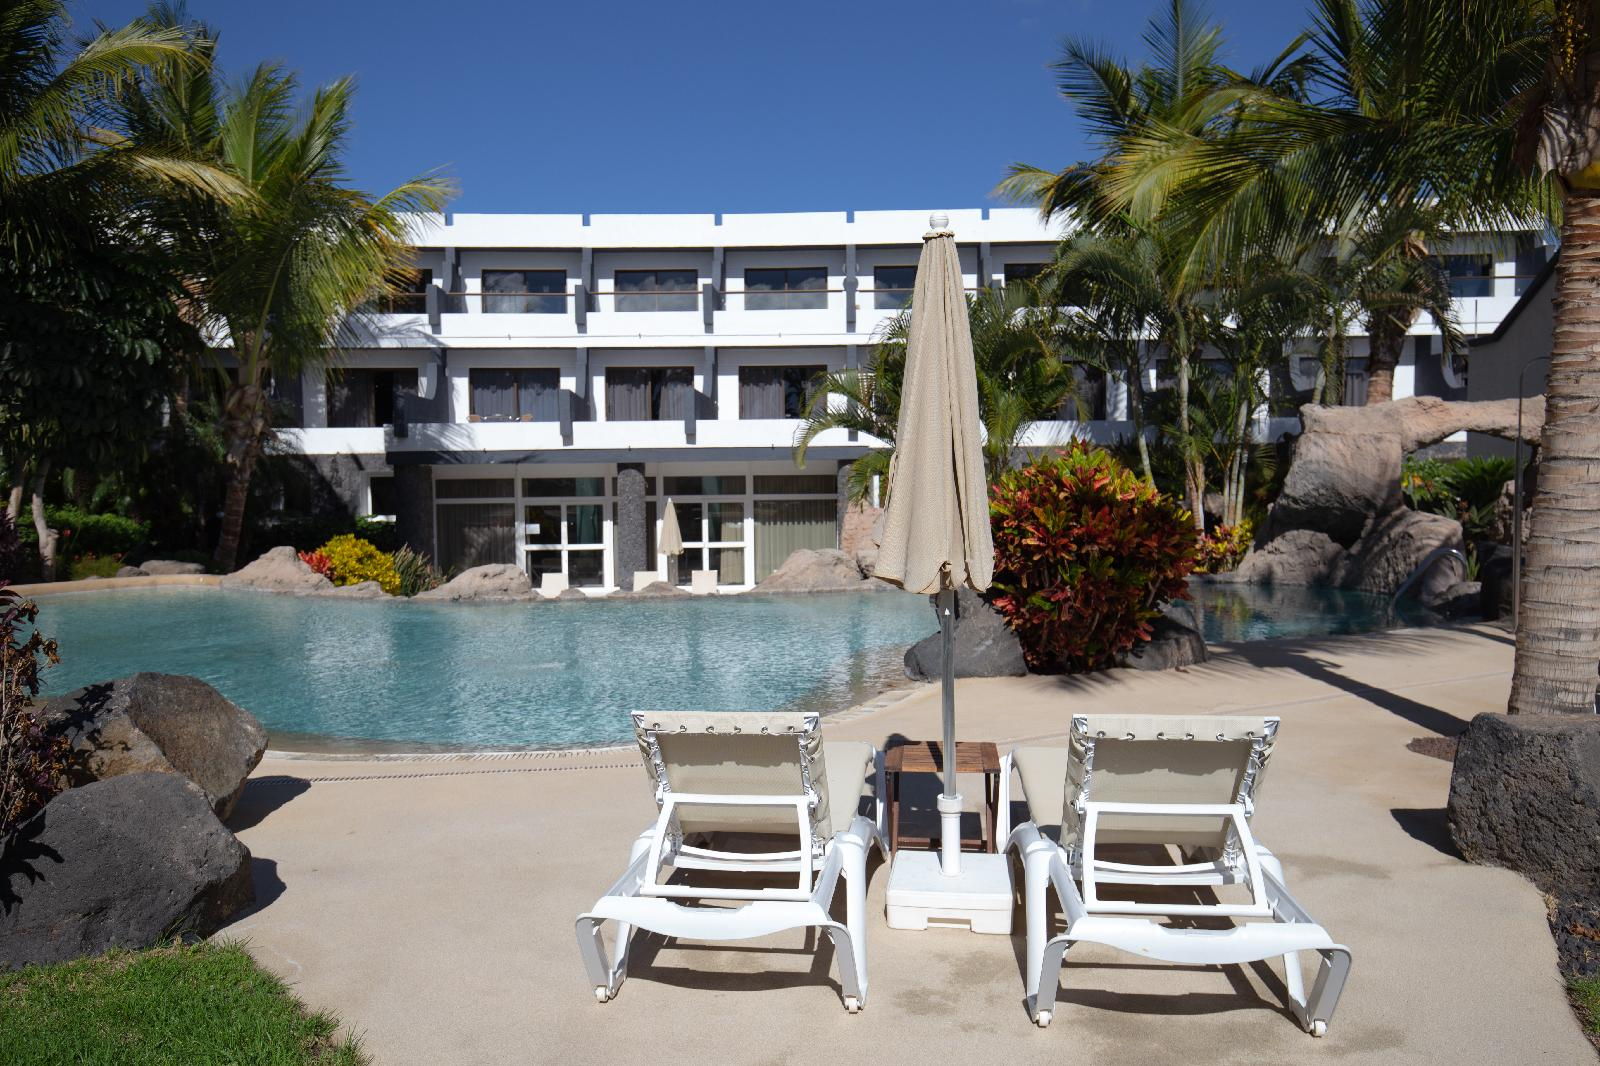 R2 romantic fantasia suites design hotel adults only en for Designhotel fuerteventura